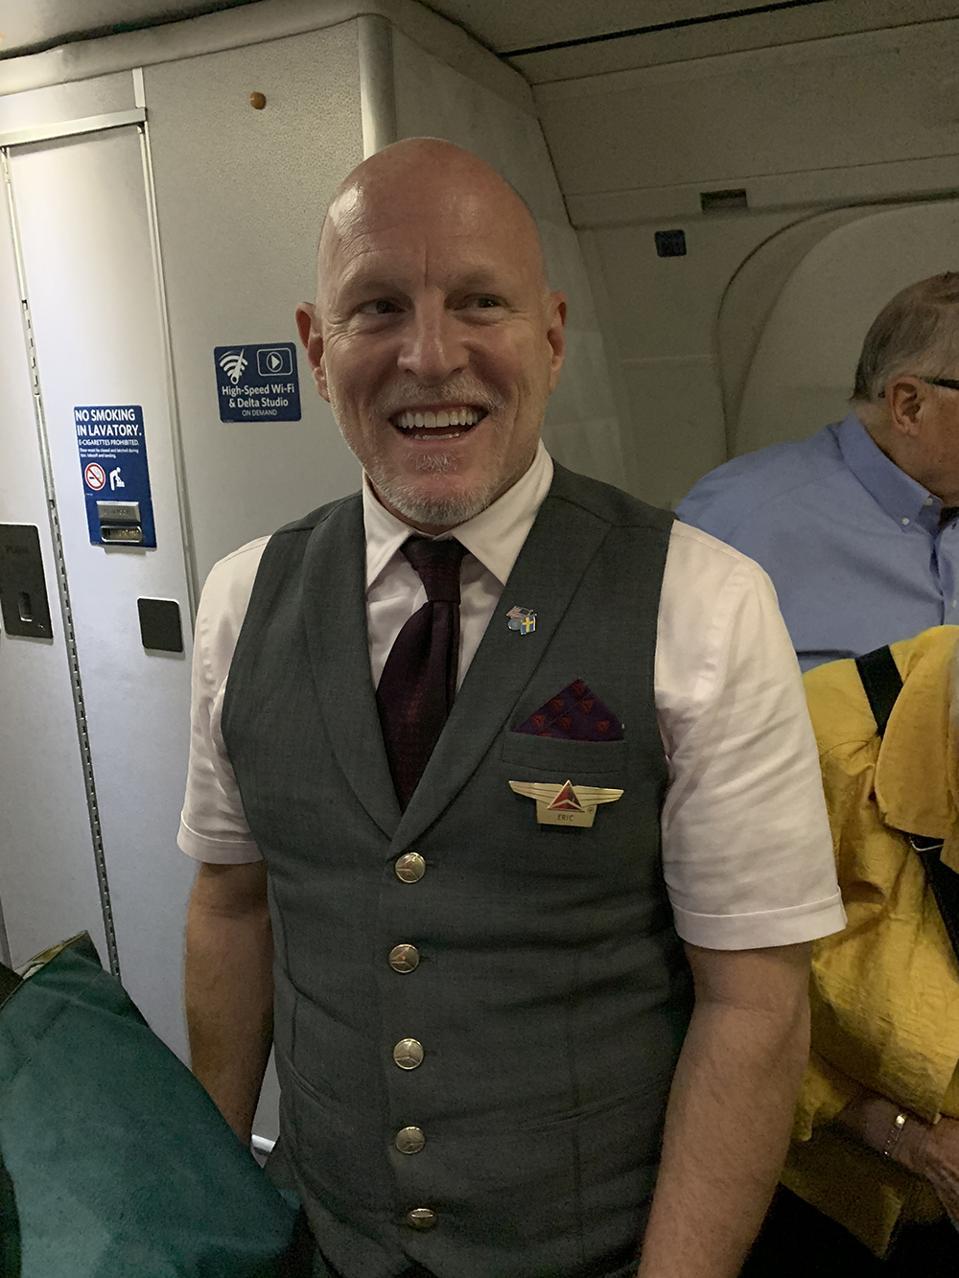 The best flight attendant ever.